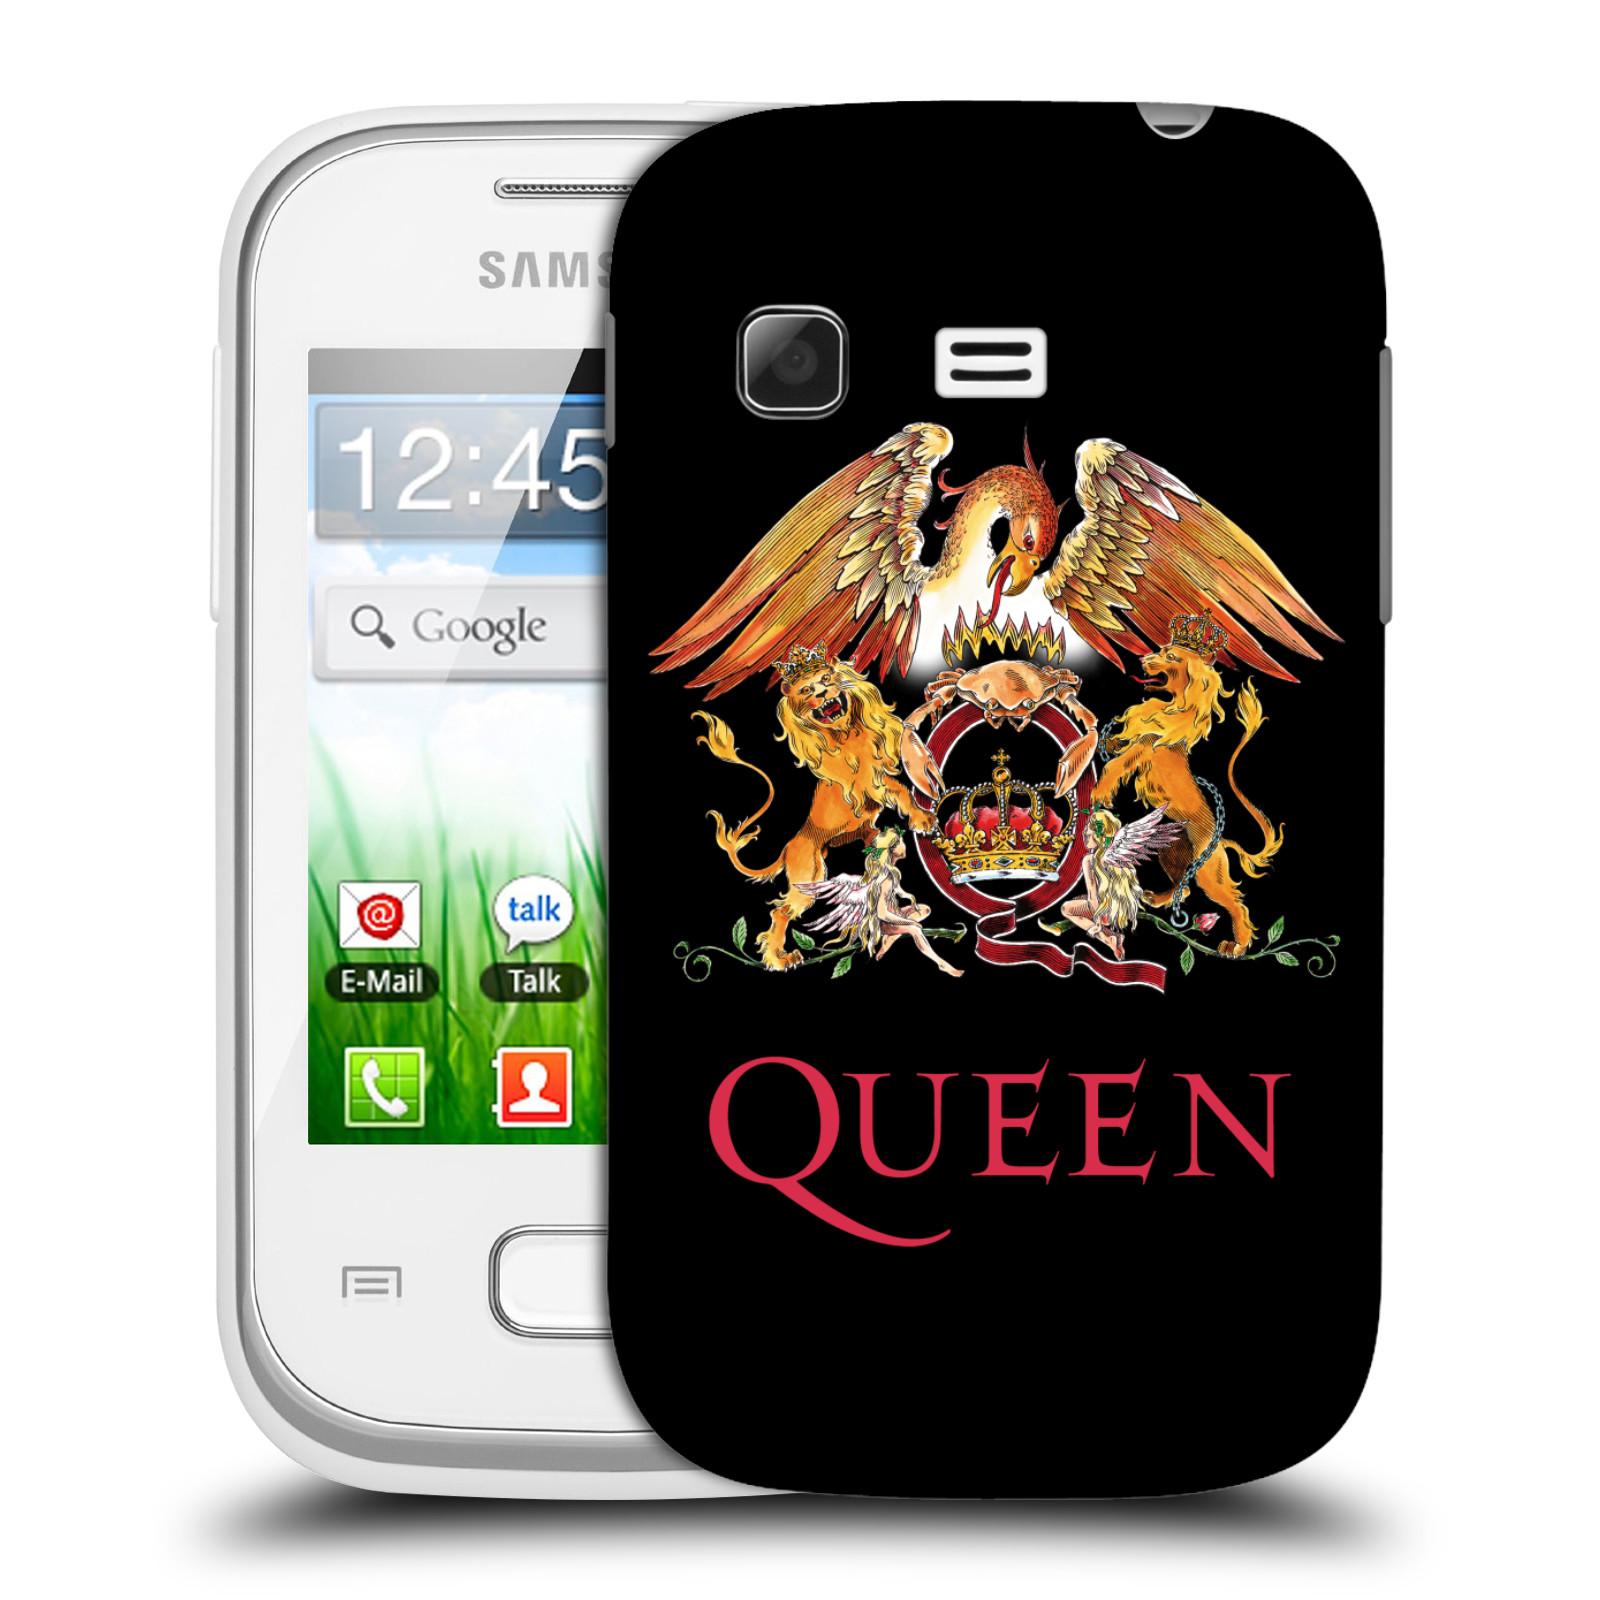 Plastové pouzdro na mobil Samsung Galaxy Pocket HEAD CASE Queen - Logo (Plastový kryt či obal na mobilní telefon licencovaným motivem Queen pro Samsung Galaxy Pocket GT-S5300)